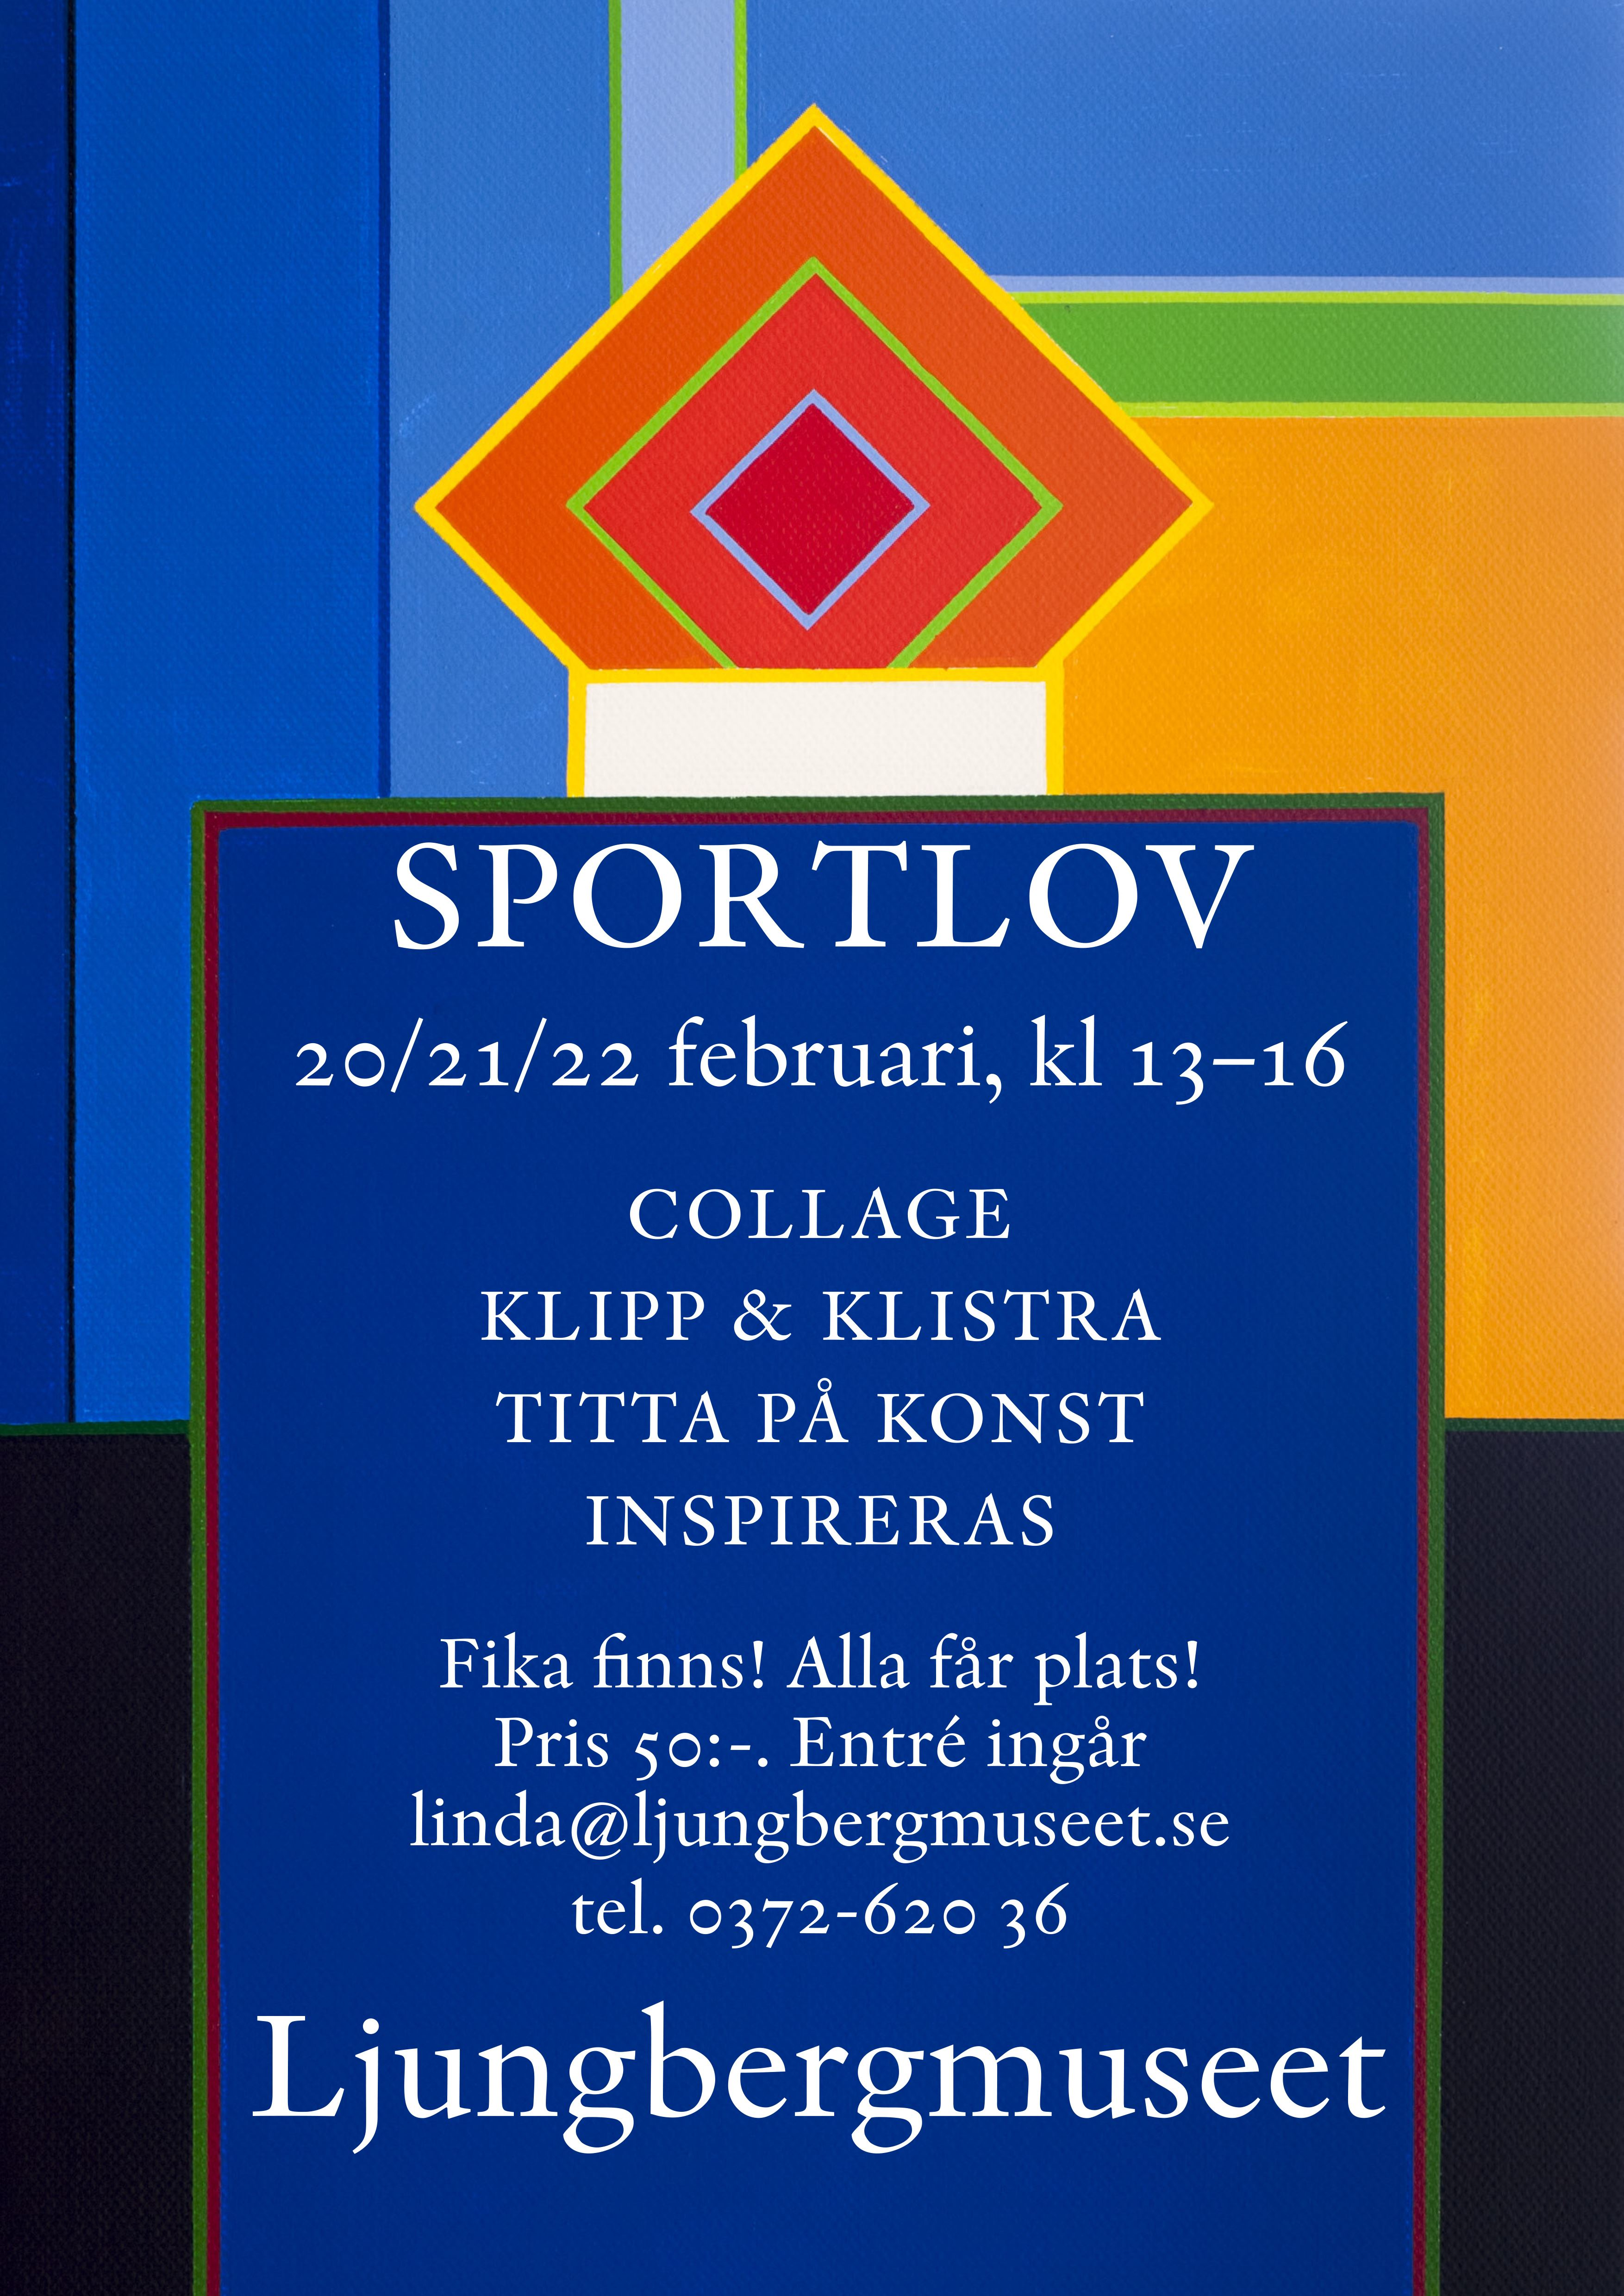 Sportlovsverkstad på Ljungbergsmuseet